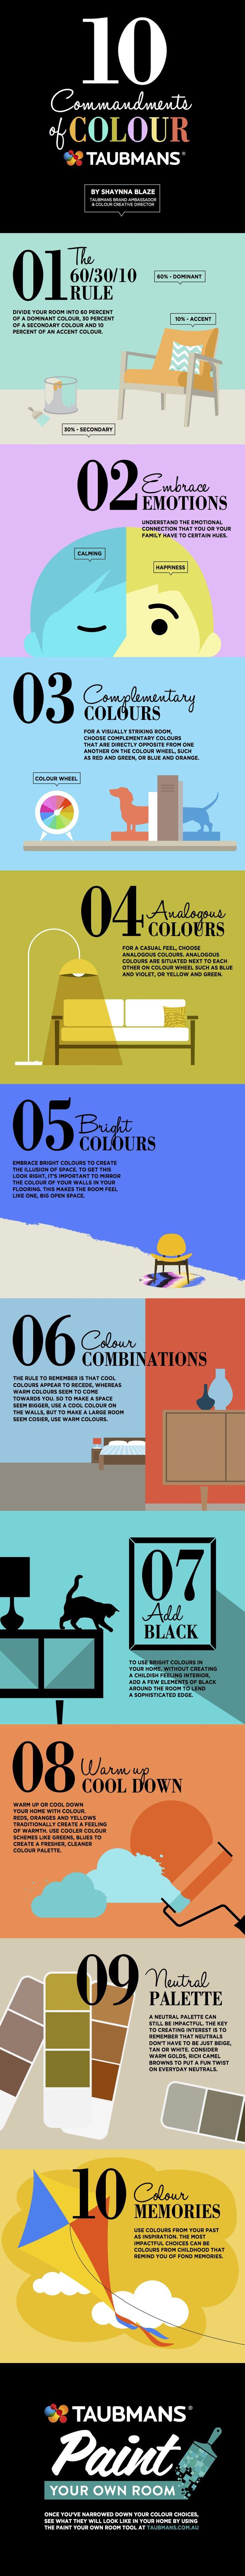 Taubmans 10 Commandments of Colour Infographic